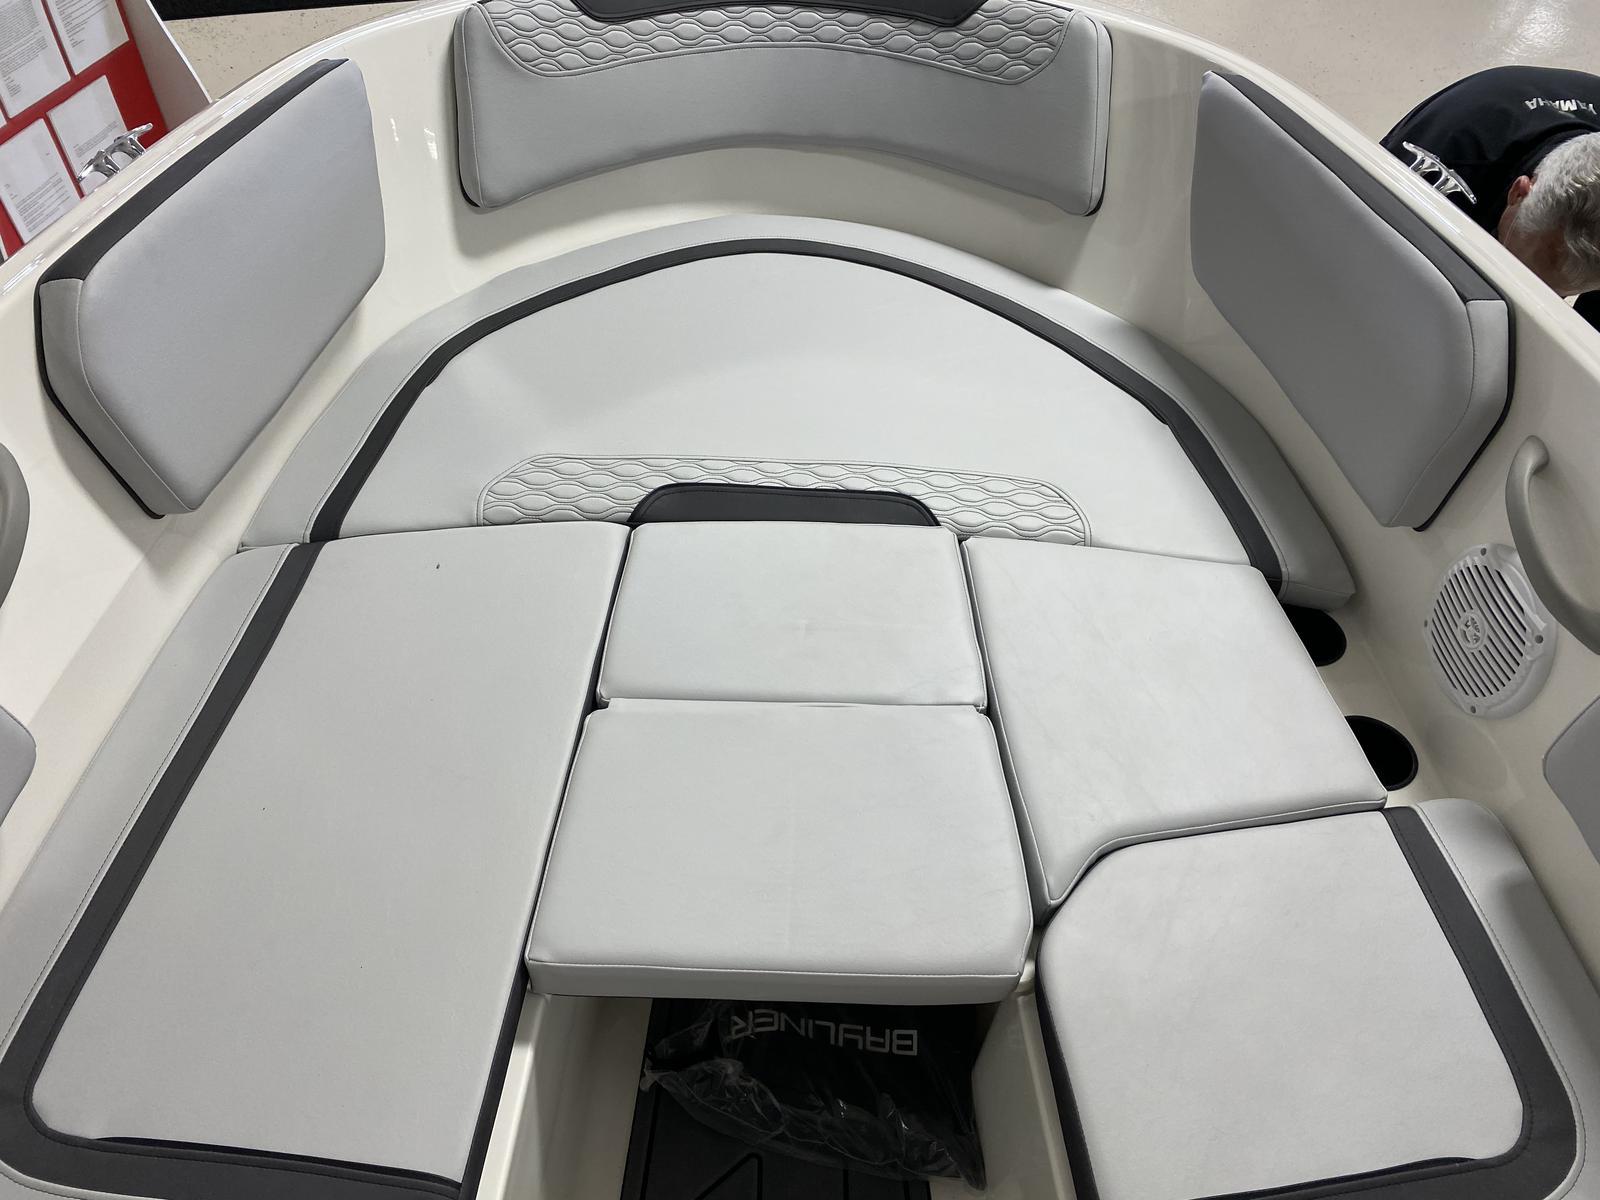 2021 Bayliner boat for sale, model of the boat is M-15 & Image # 3 of 4